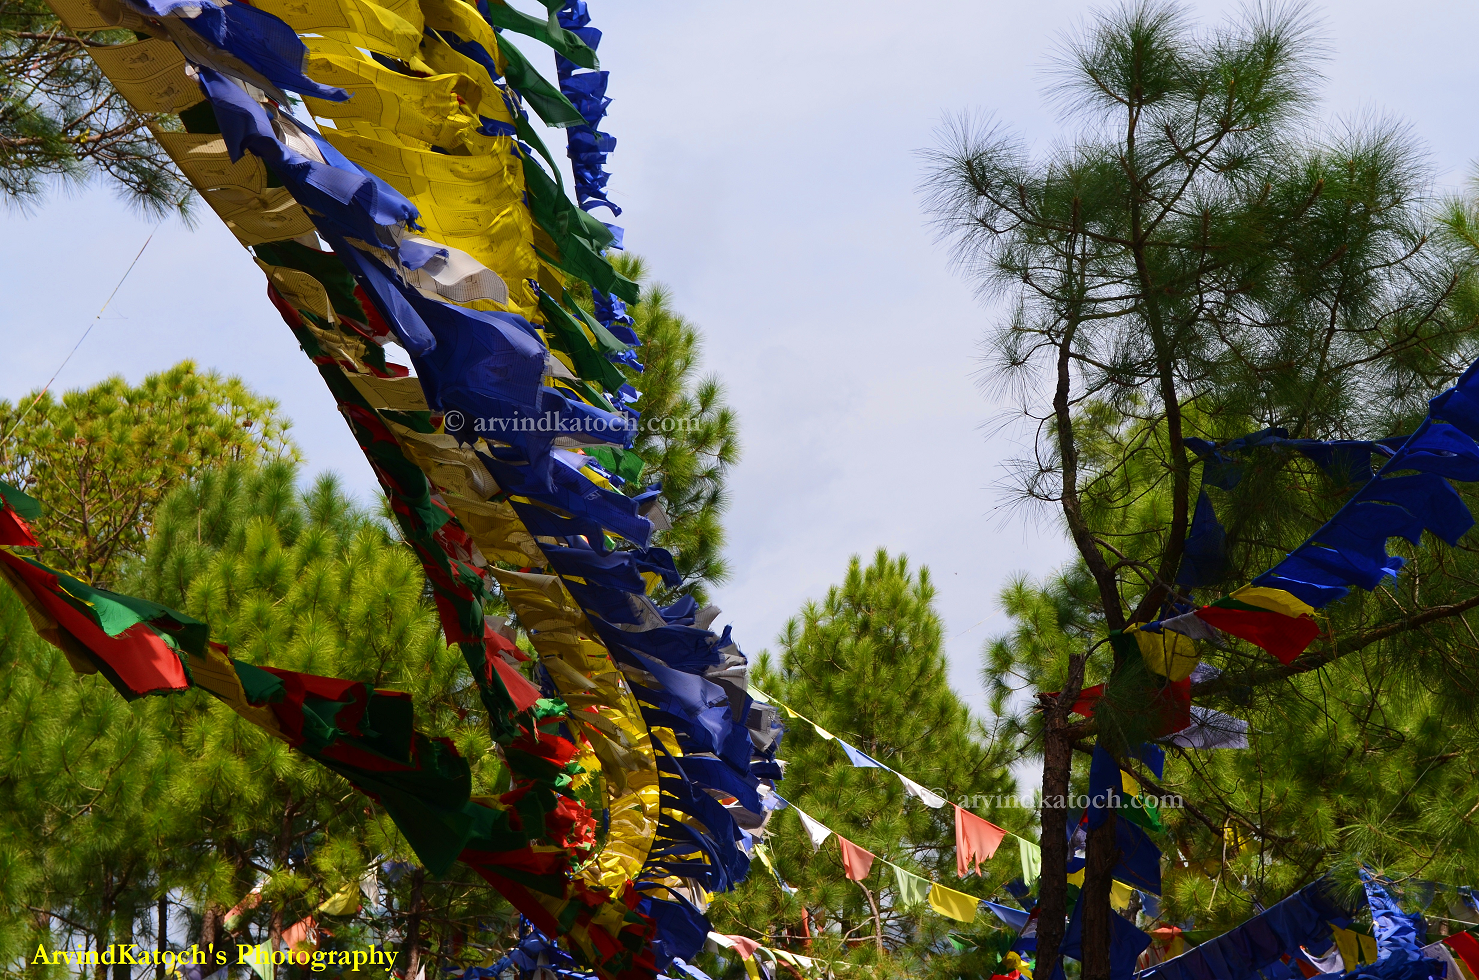 http://2.bp.blogspot.com/-jMz0rae0ovs/UIqAZ6PTW7I/AAAAAAAALGc/gOanHM1xy4s/s1600/TibetanchantingflagsLow.png